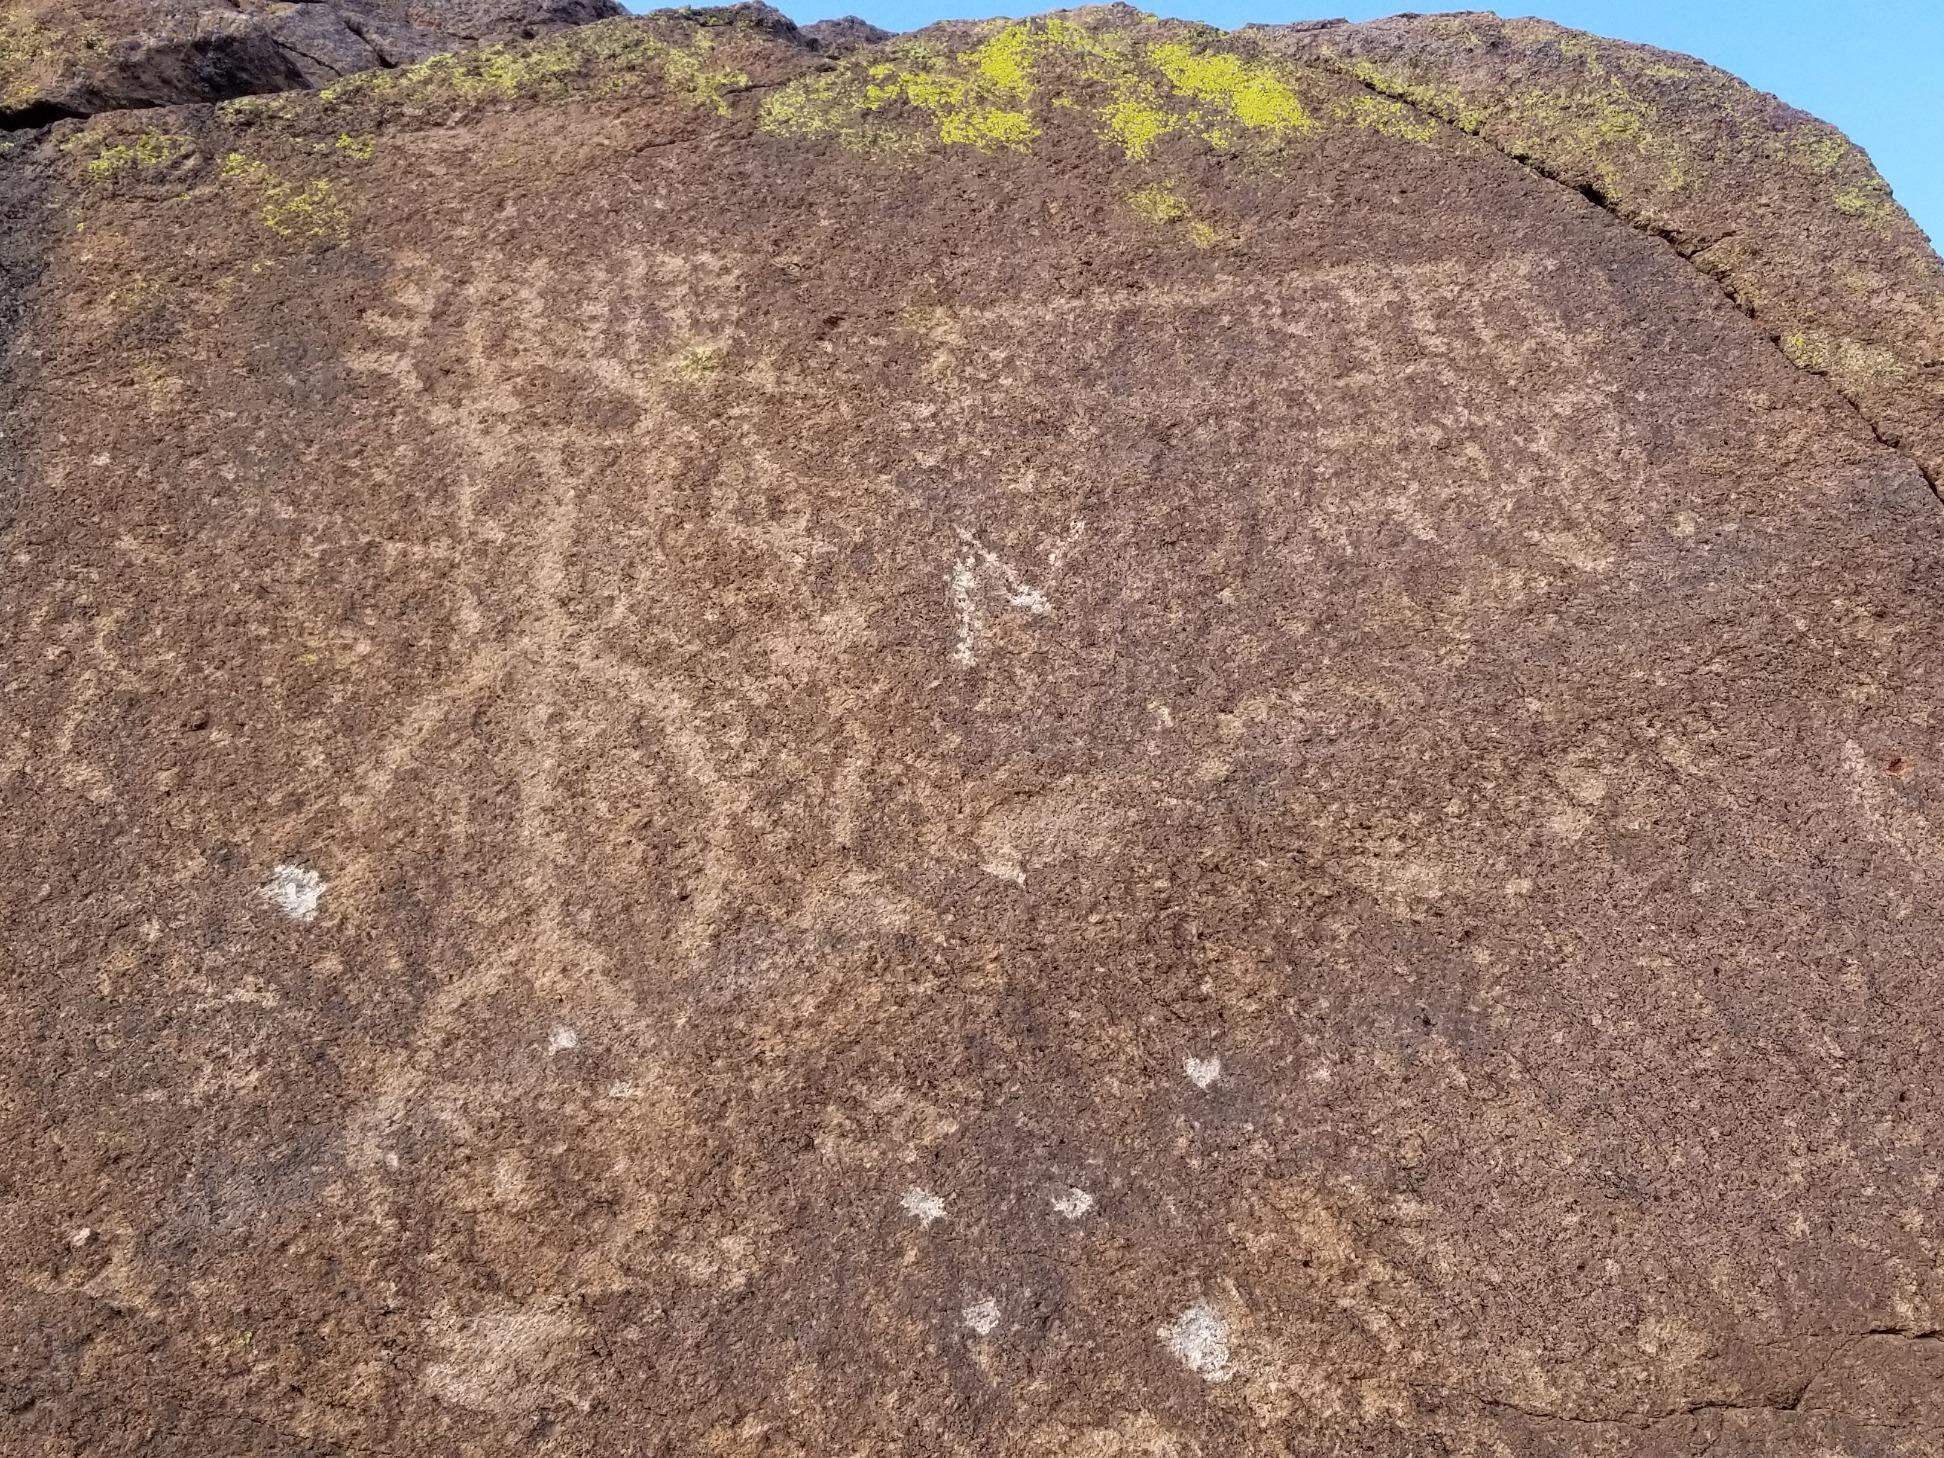 alter rock petroglyphs